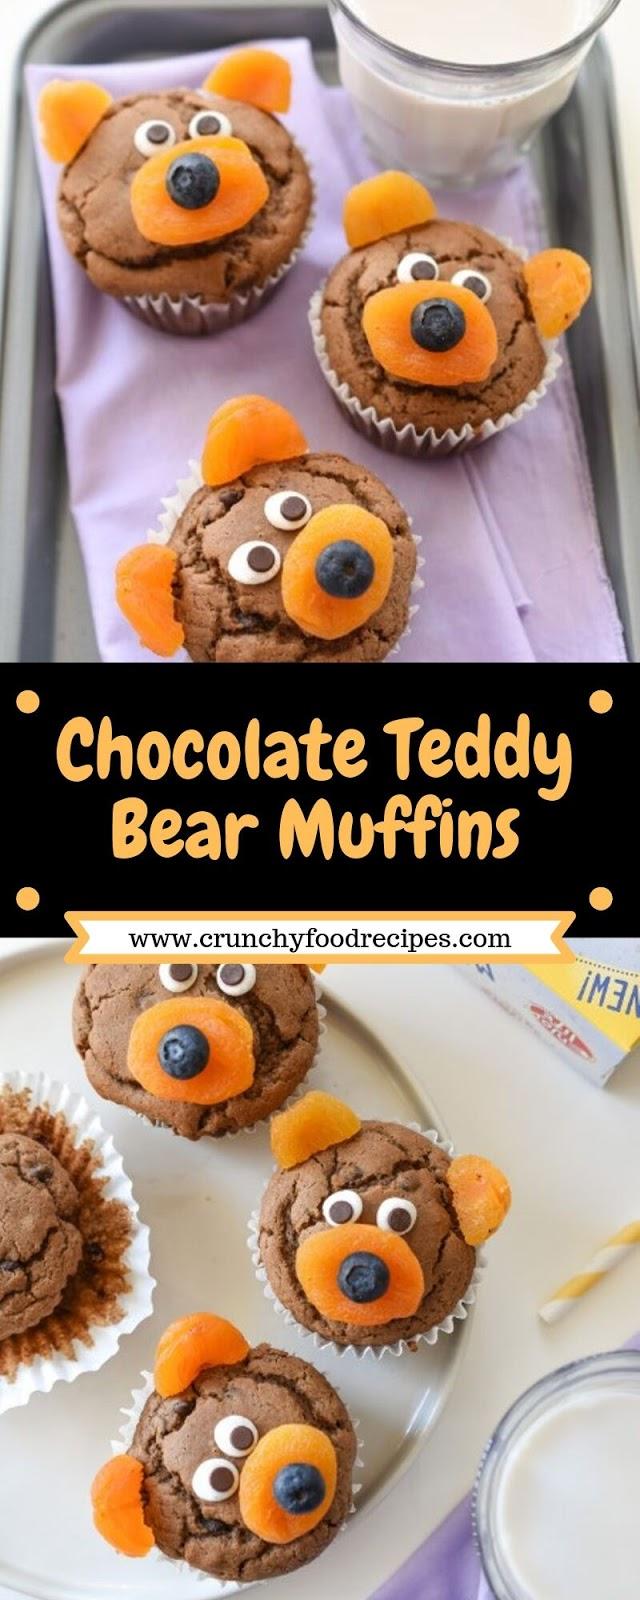 Chocolate Teddy Bear Muffins